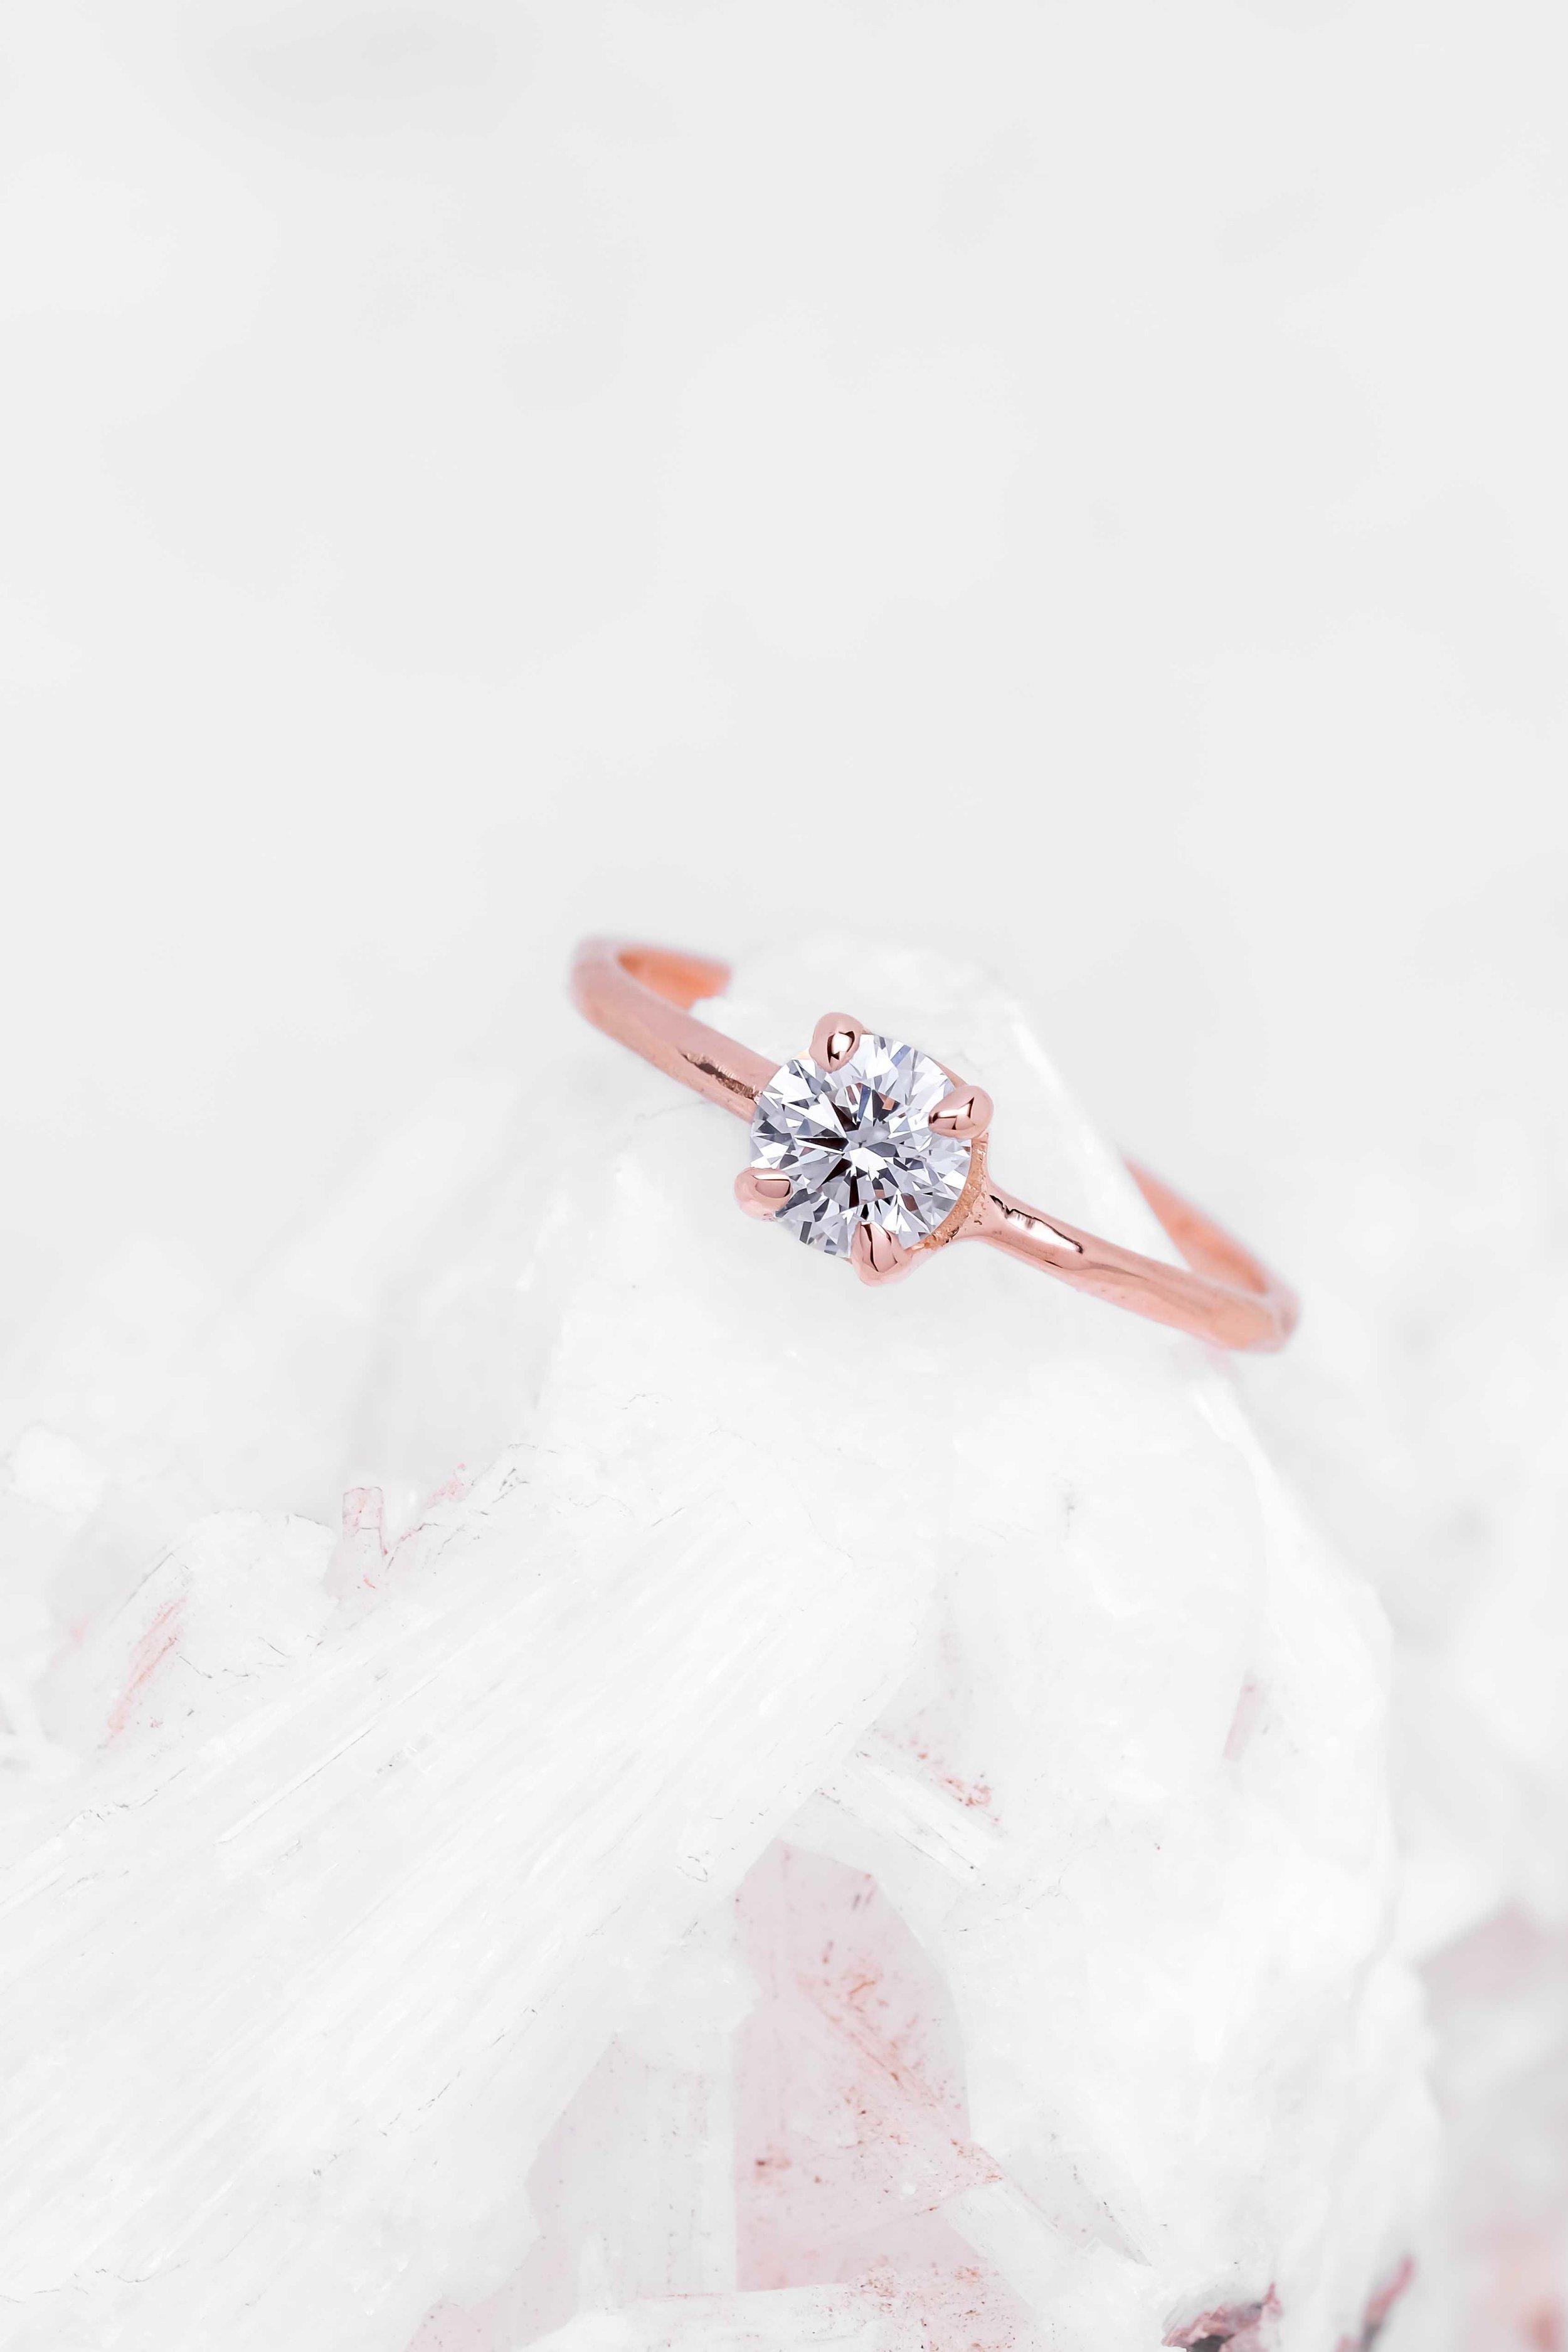 the-black-alchemy-diamonds-solitaire-ring-6.jpg